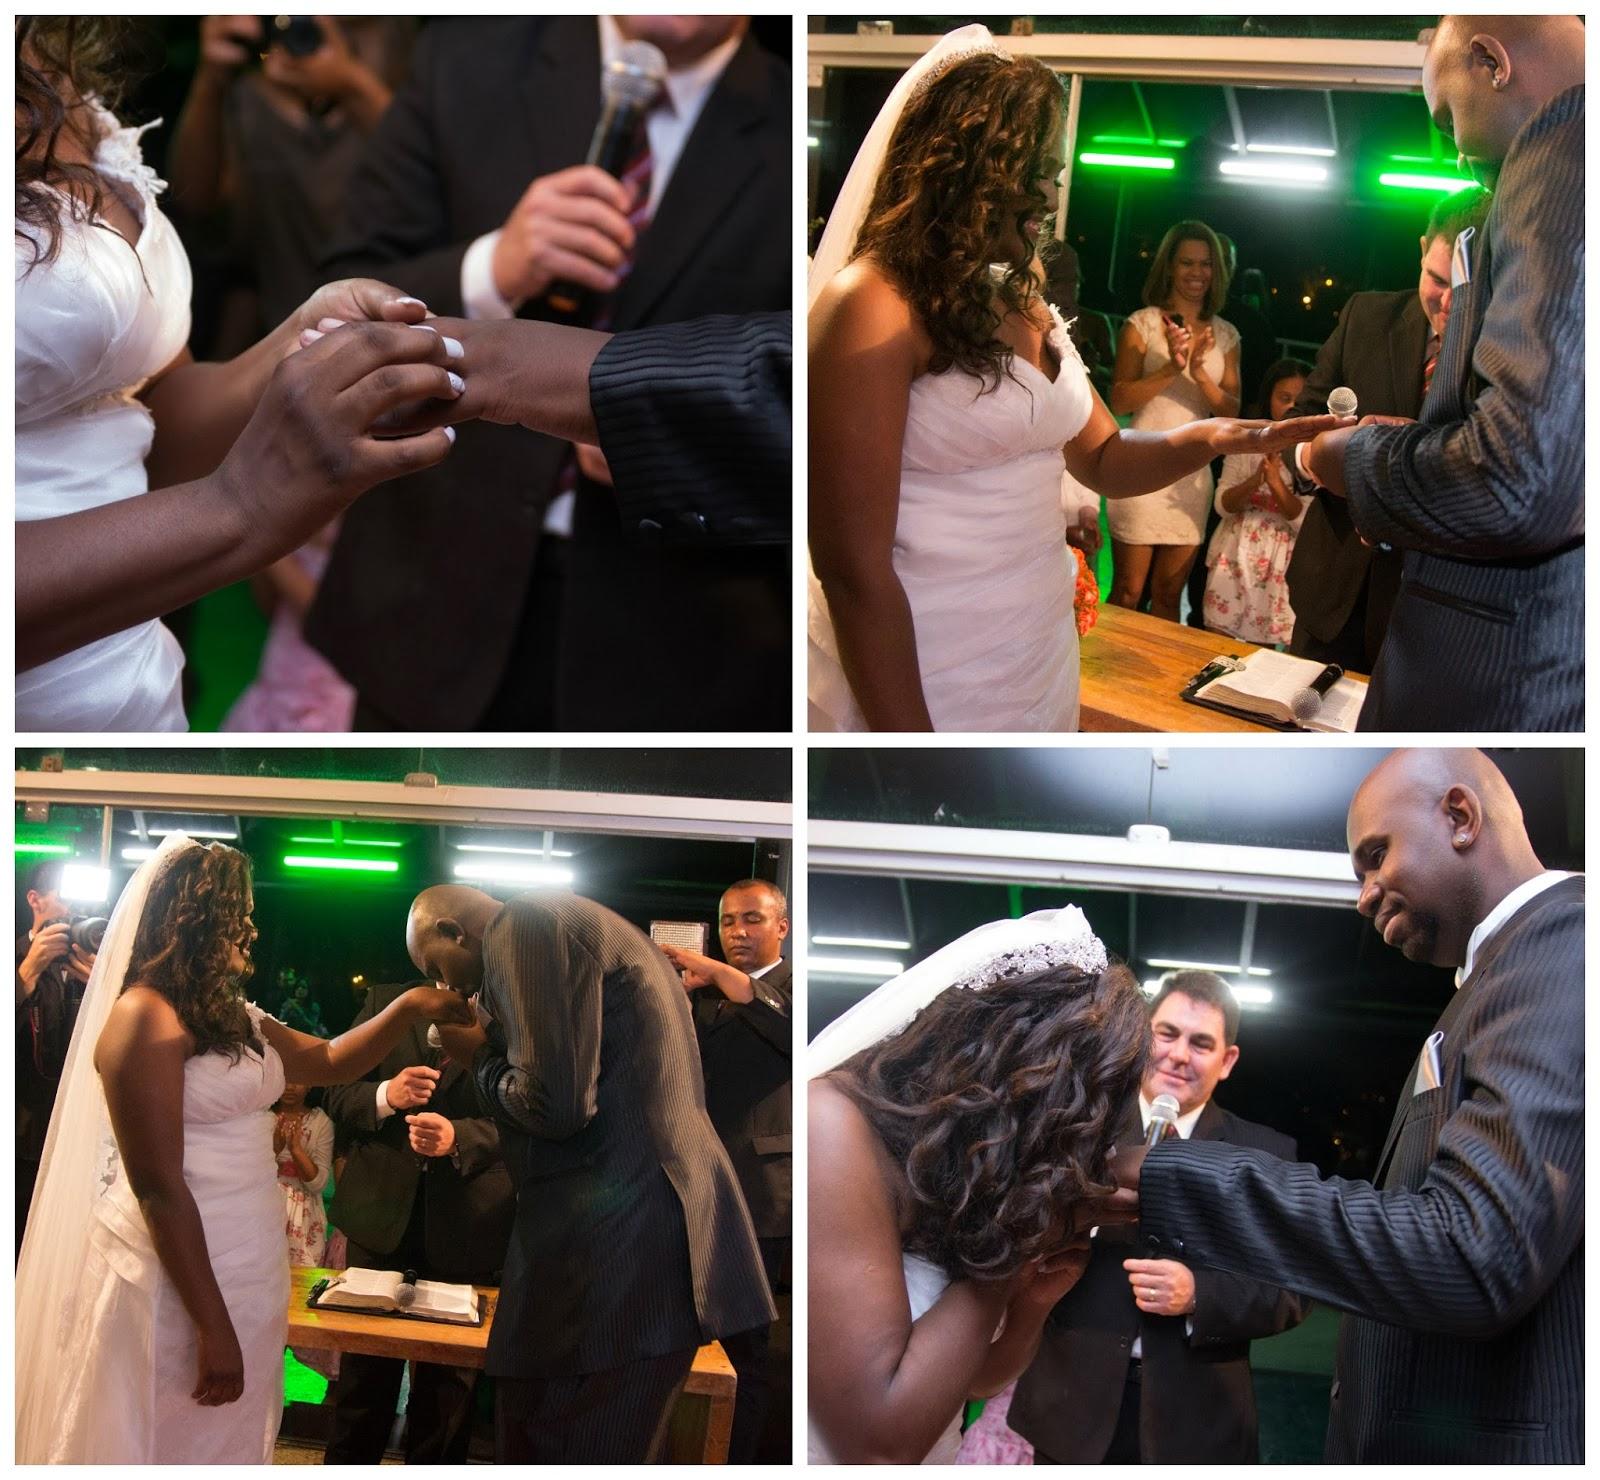 historia-amor-fe-cerimonia-troca-aliancas-1